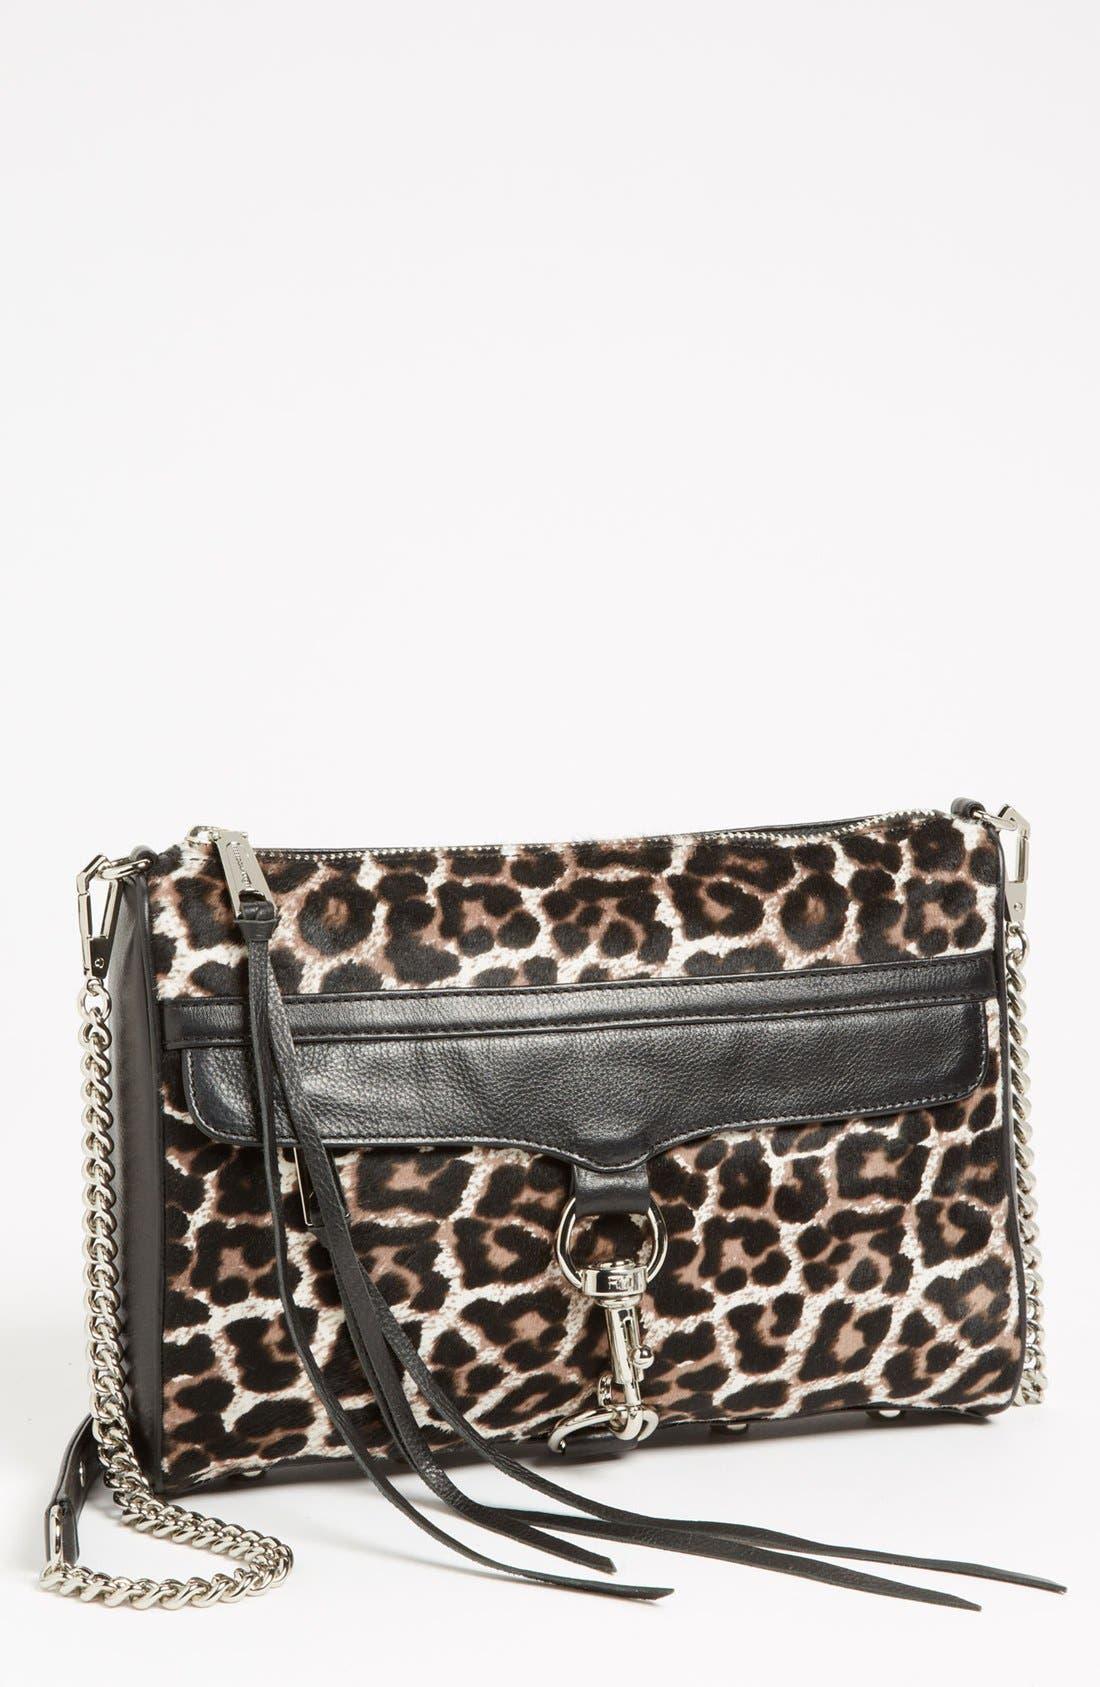 Main Image - Rebecca Minkoff 'MAC Clutch' Calf Hair Crossbody Bag, Small